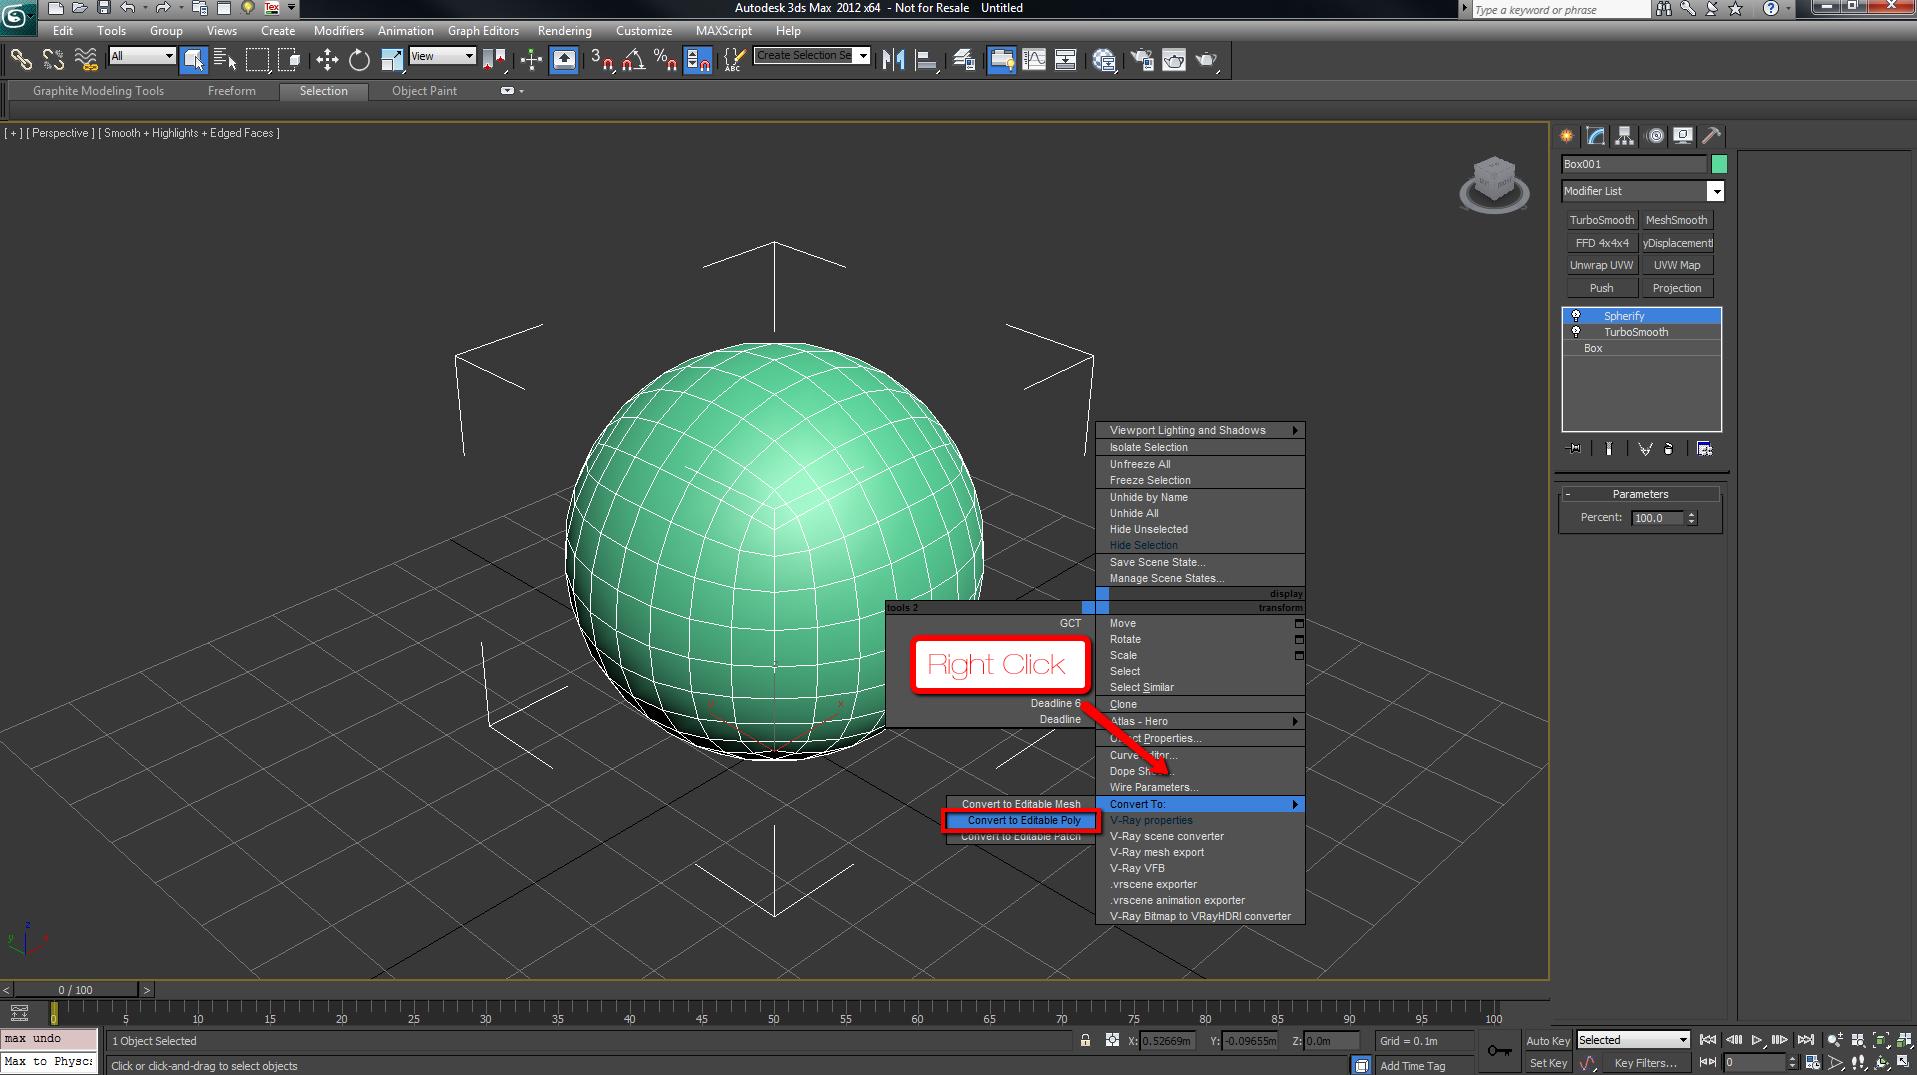 Making a Quad Sphere: 3ds Max, Maya, & Cinema 4D - TurboSquid Blog